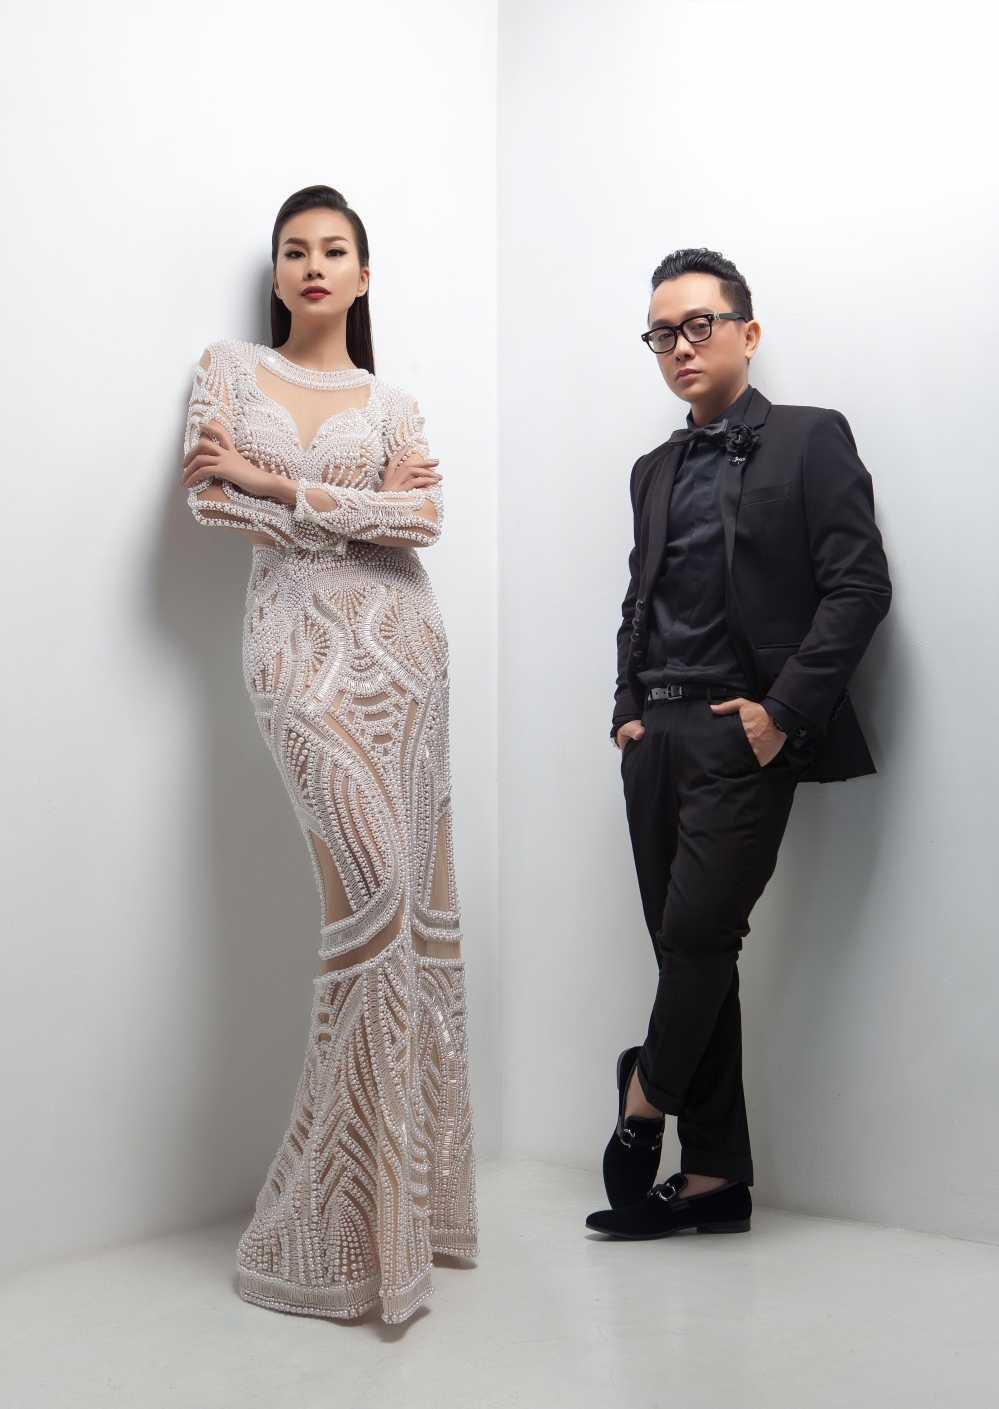 Nguyen Cong Tri moi Thanh Hang lam vedette tai Tokyo fashion week 2017 hinh anh 2